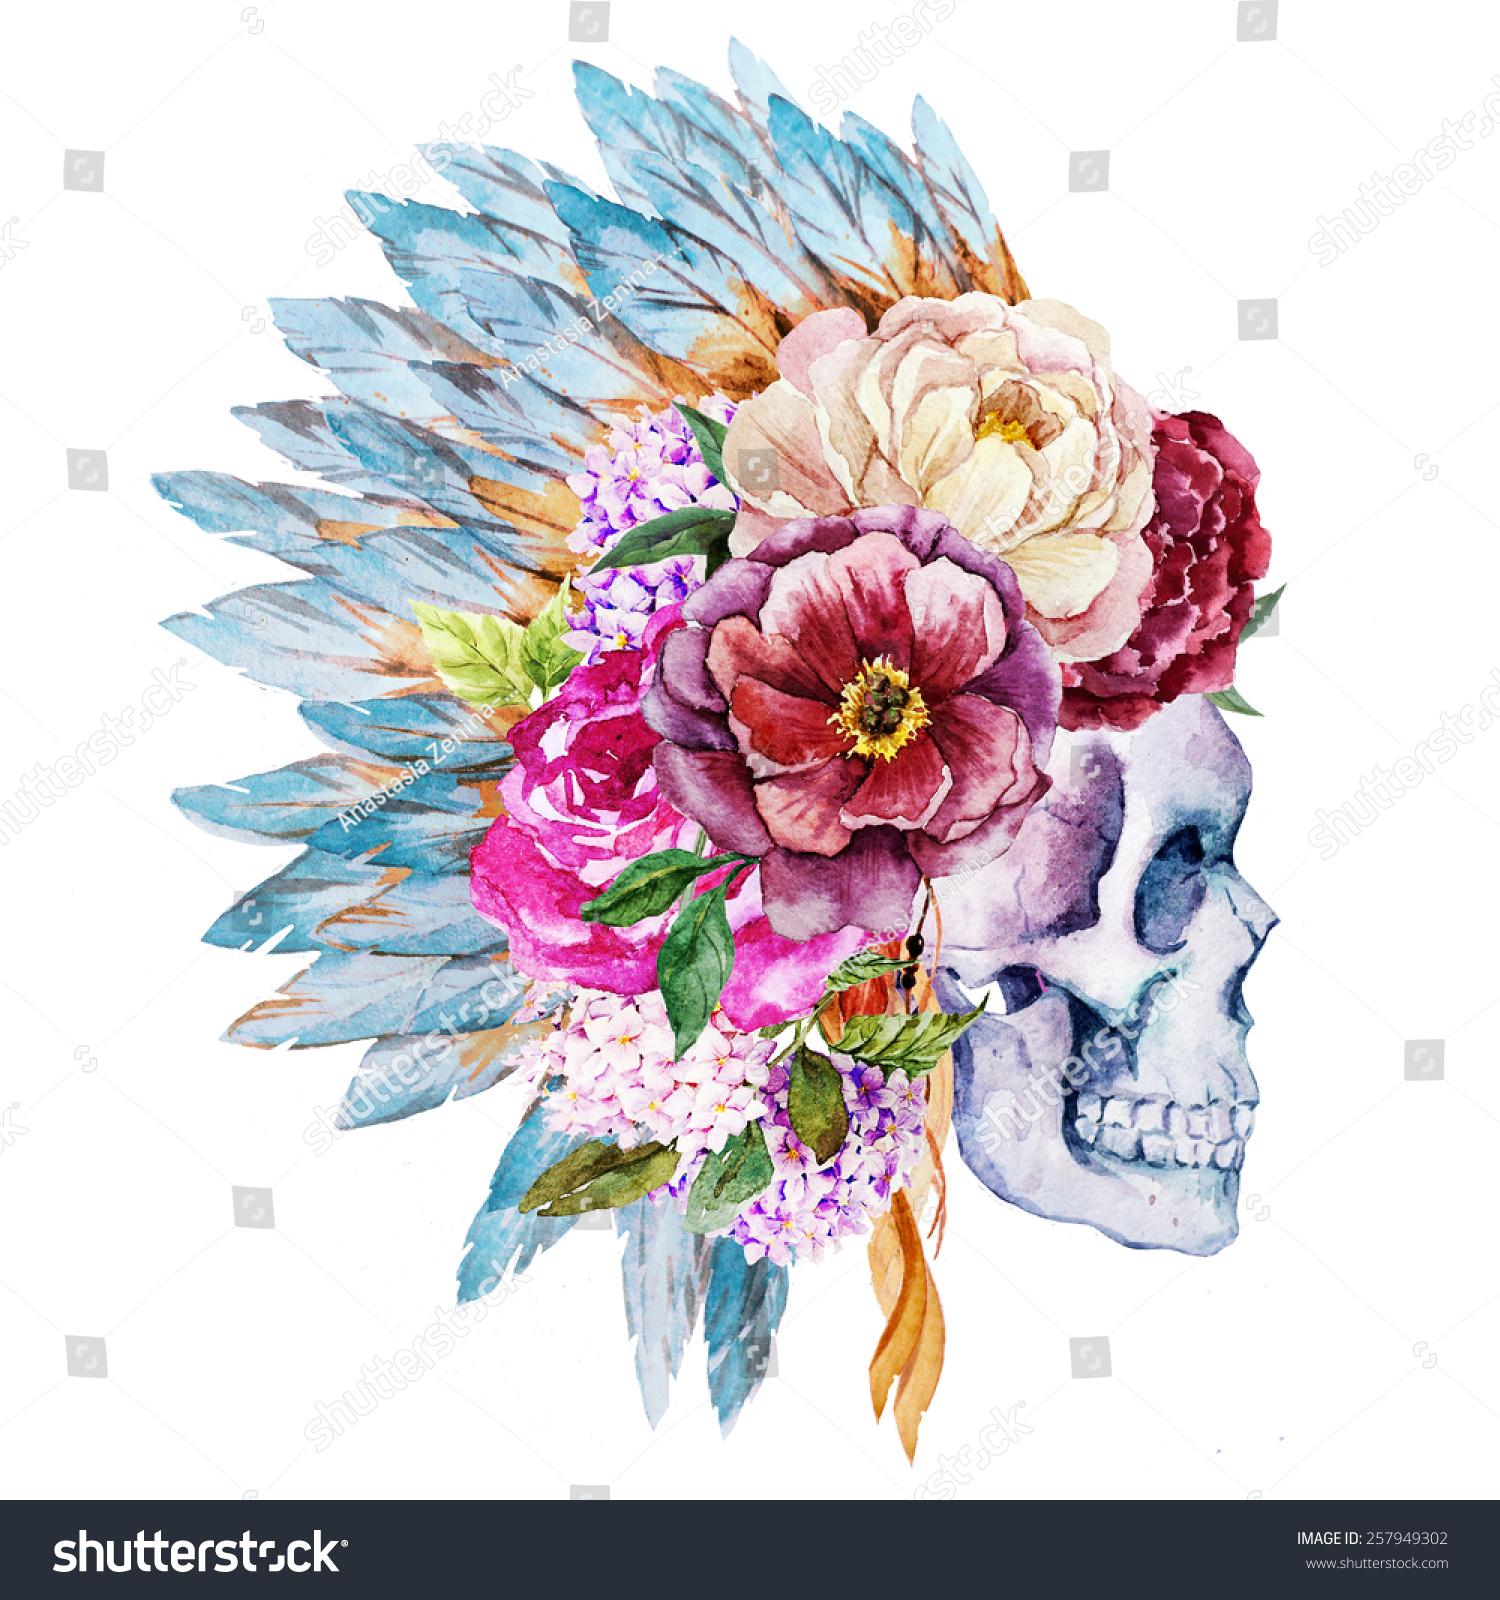 Watercolor Skull Feathers Flowers Head Stock Illustration Shutter